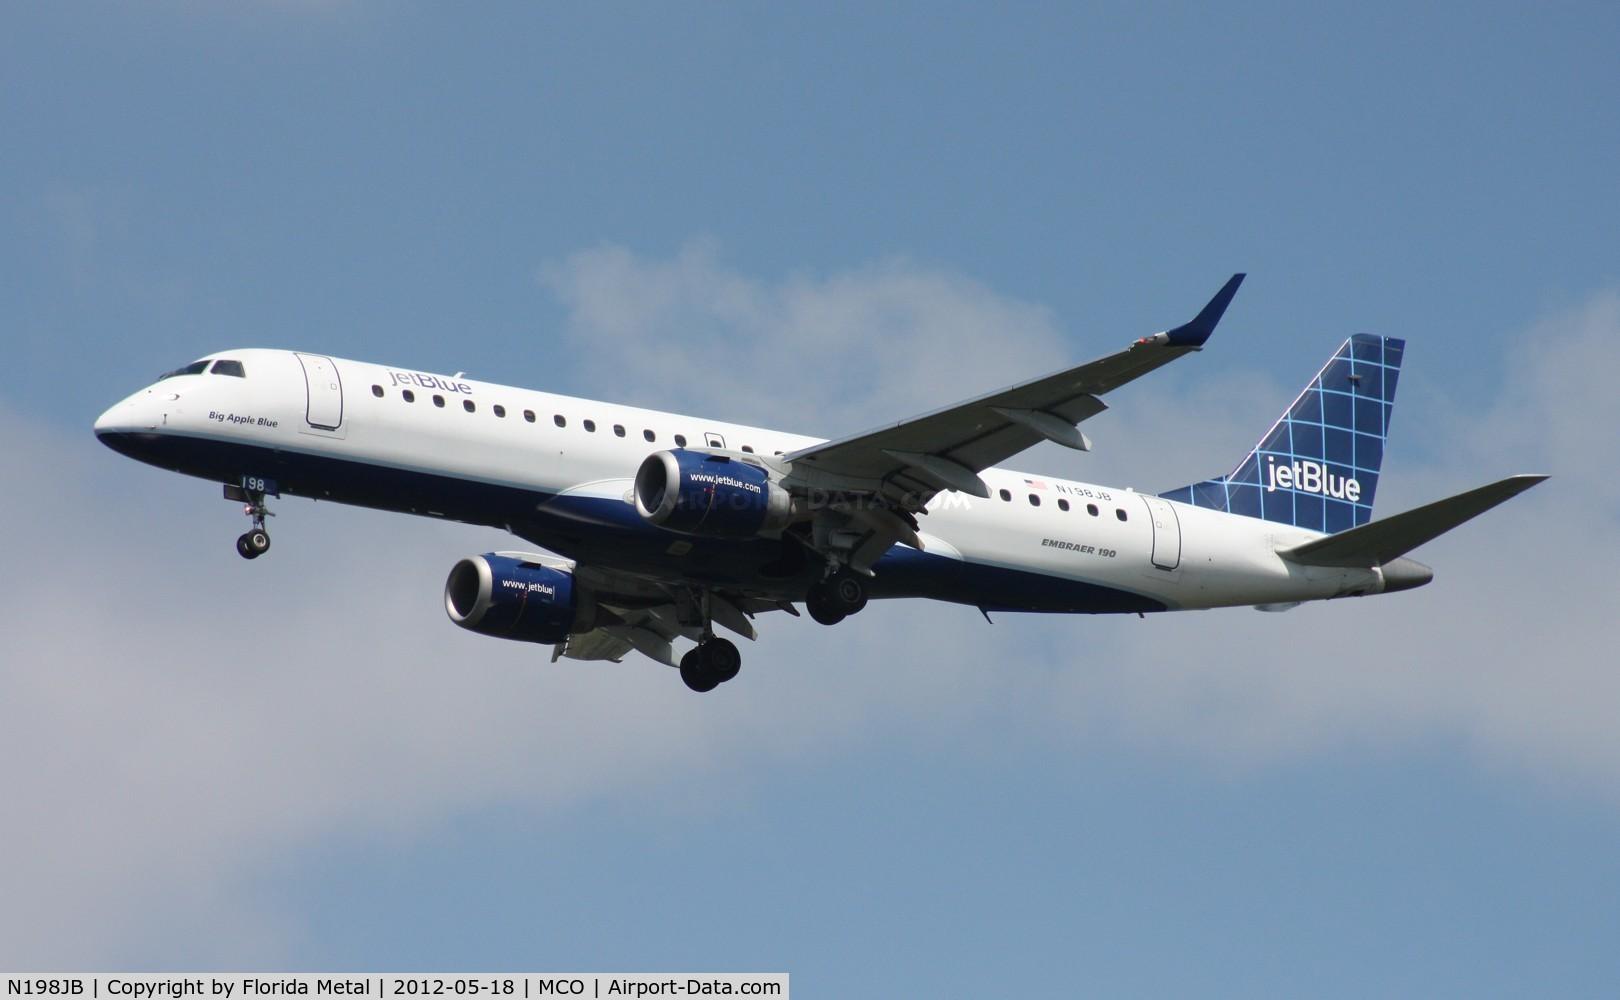 N198JB, 2006 Embraer 190AR (ERJ-190-100IGW) C/N 19000021, Jet Blue E190